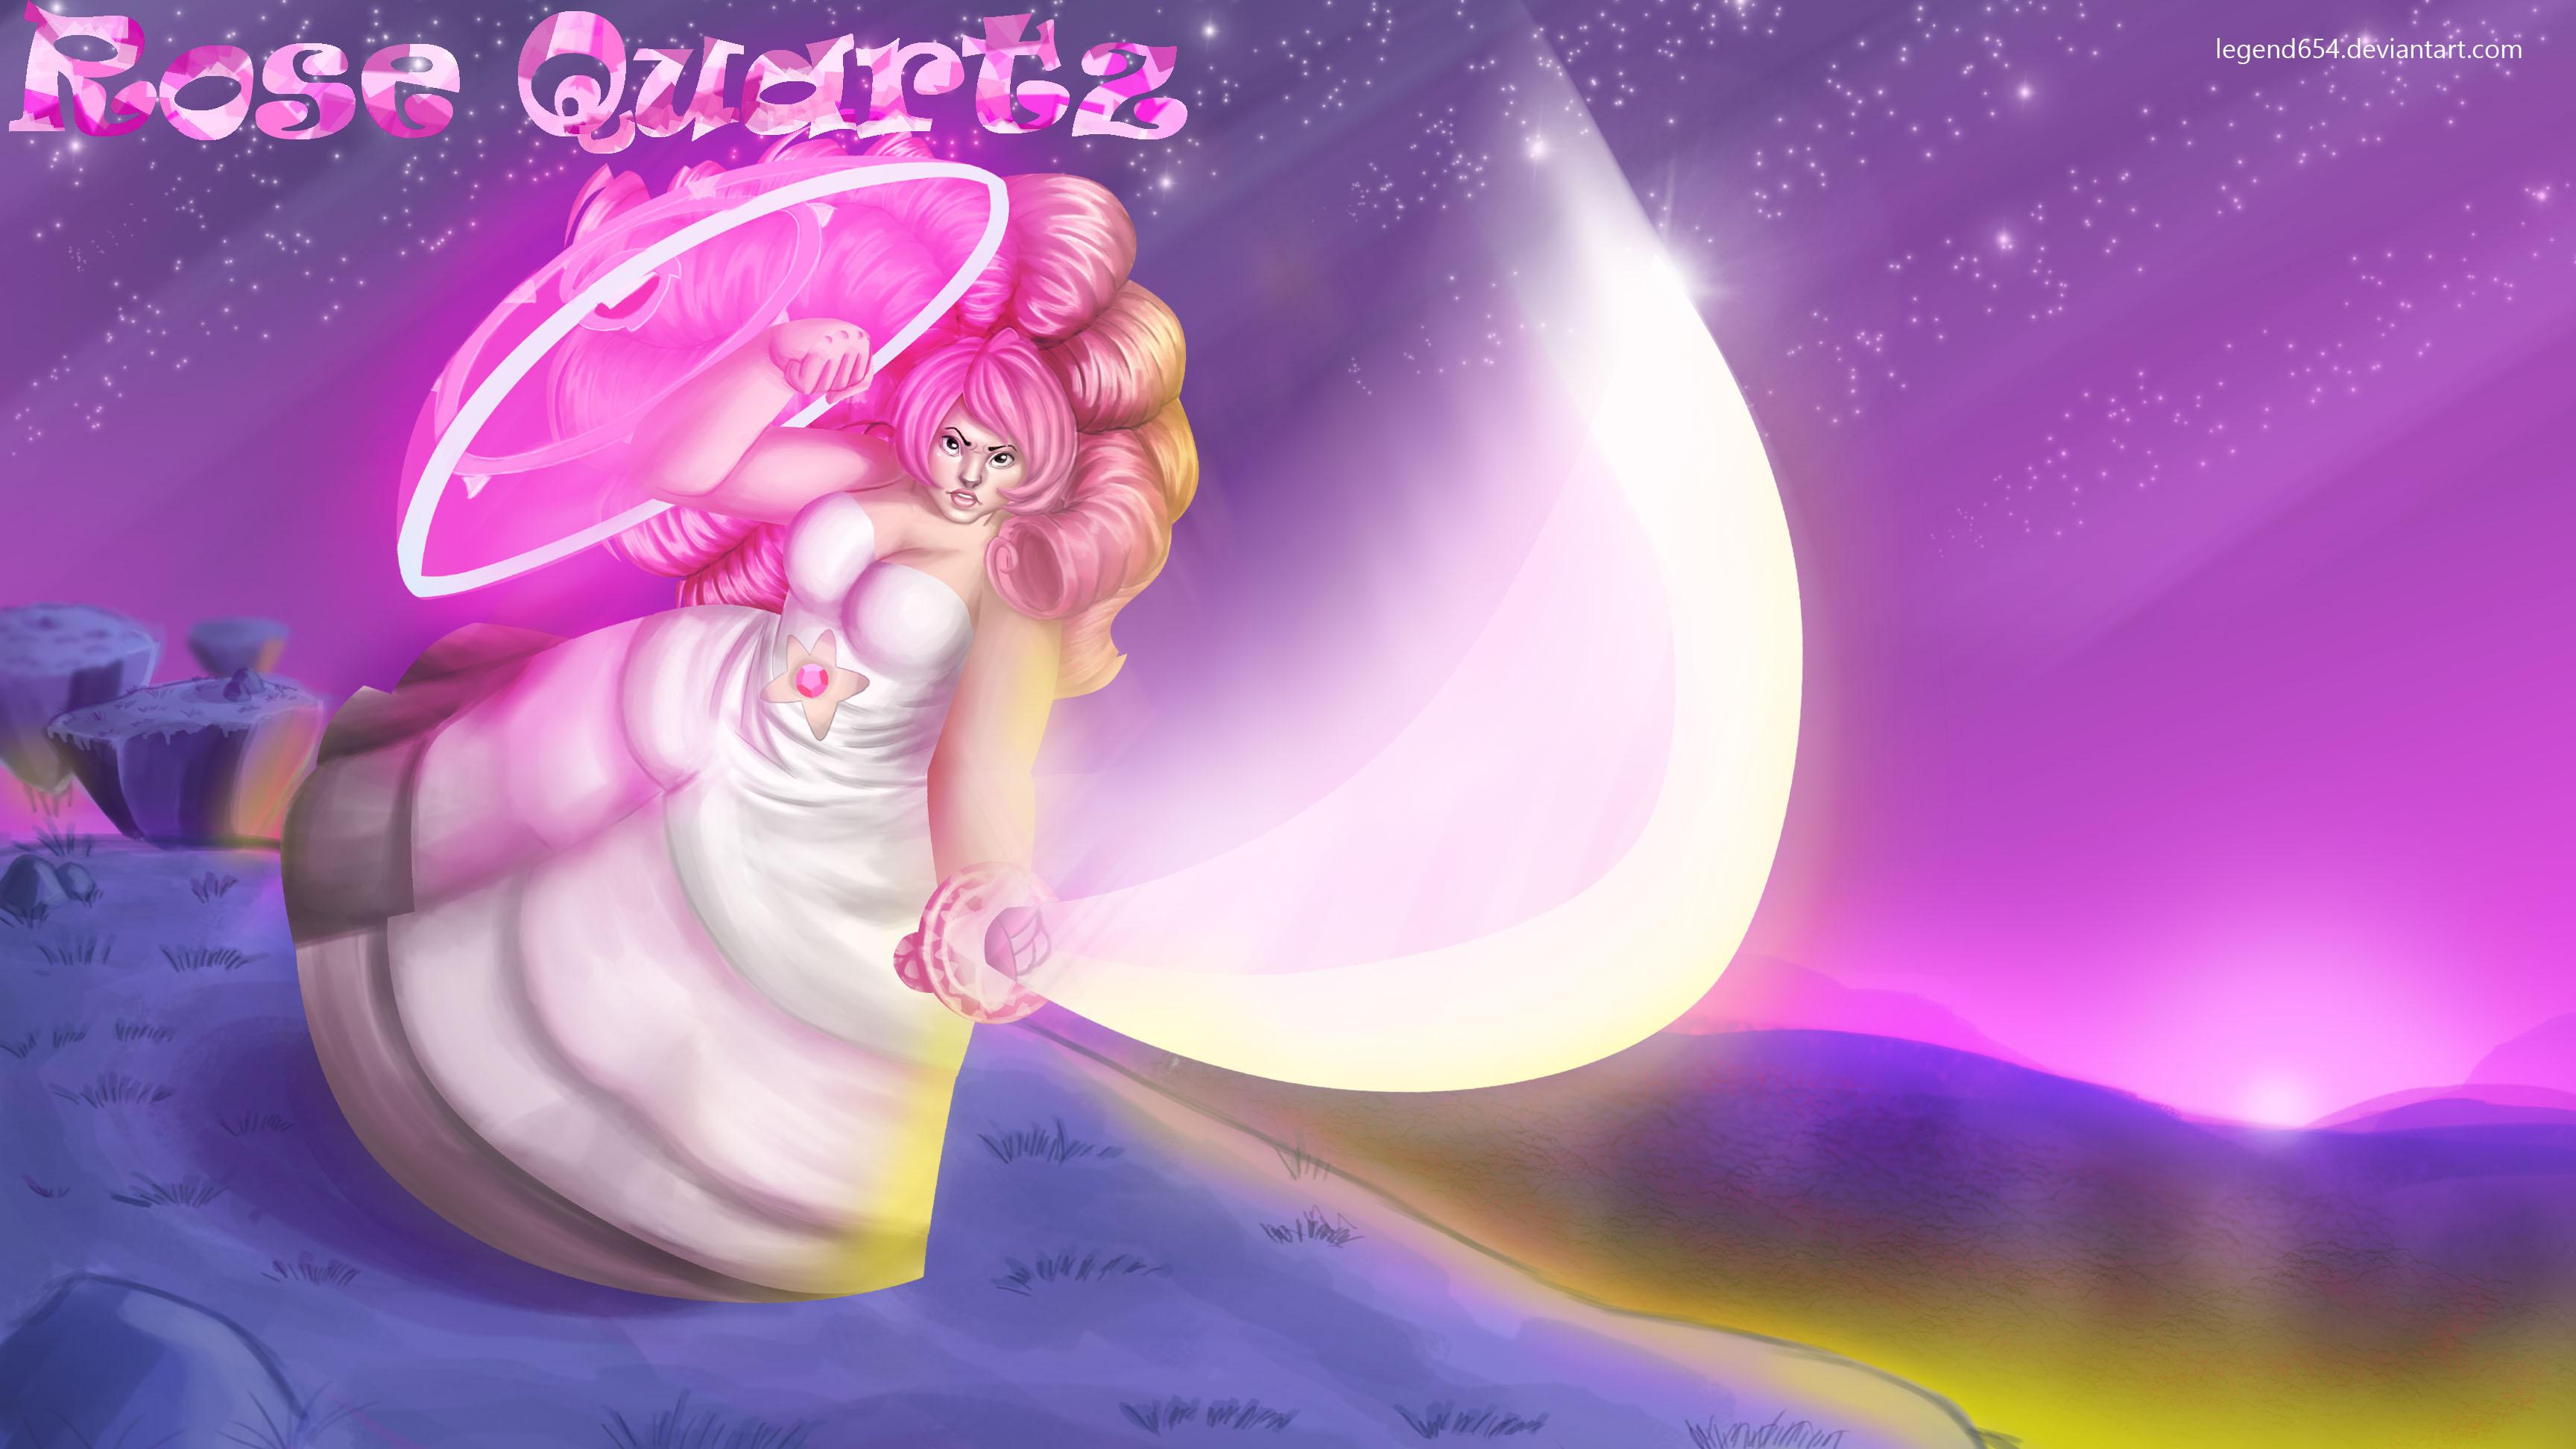 Fan Art Steven Universe Rose Quartz Wallpaper